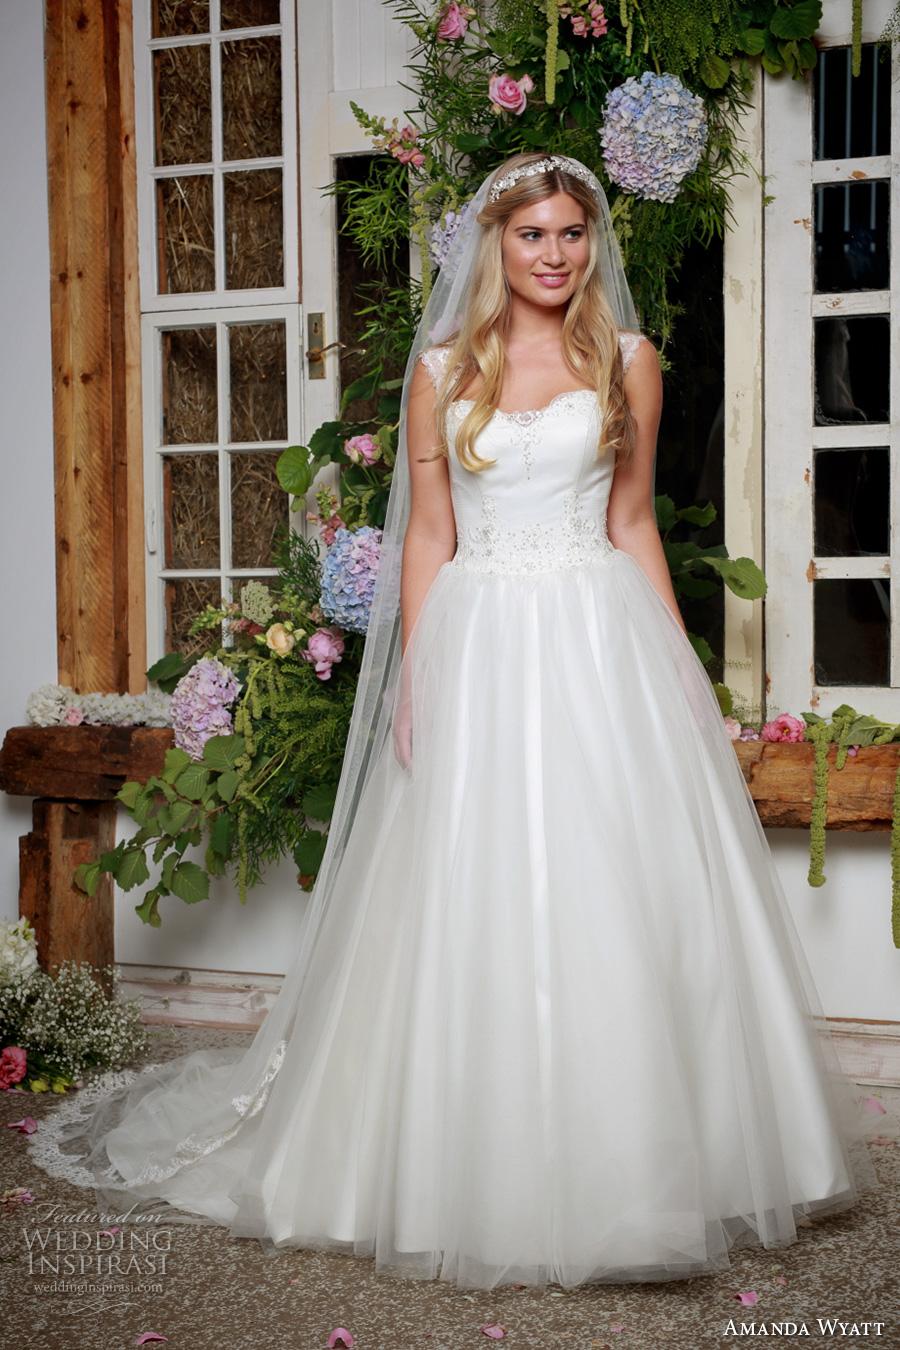 amanda wyatt 2017 bridal thick strap semi sweetheart neckline lightly embellished bodice tulle skirt ivory color romantic a  line wedding dress sweep train (mistie ivory) mv